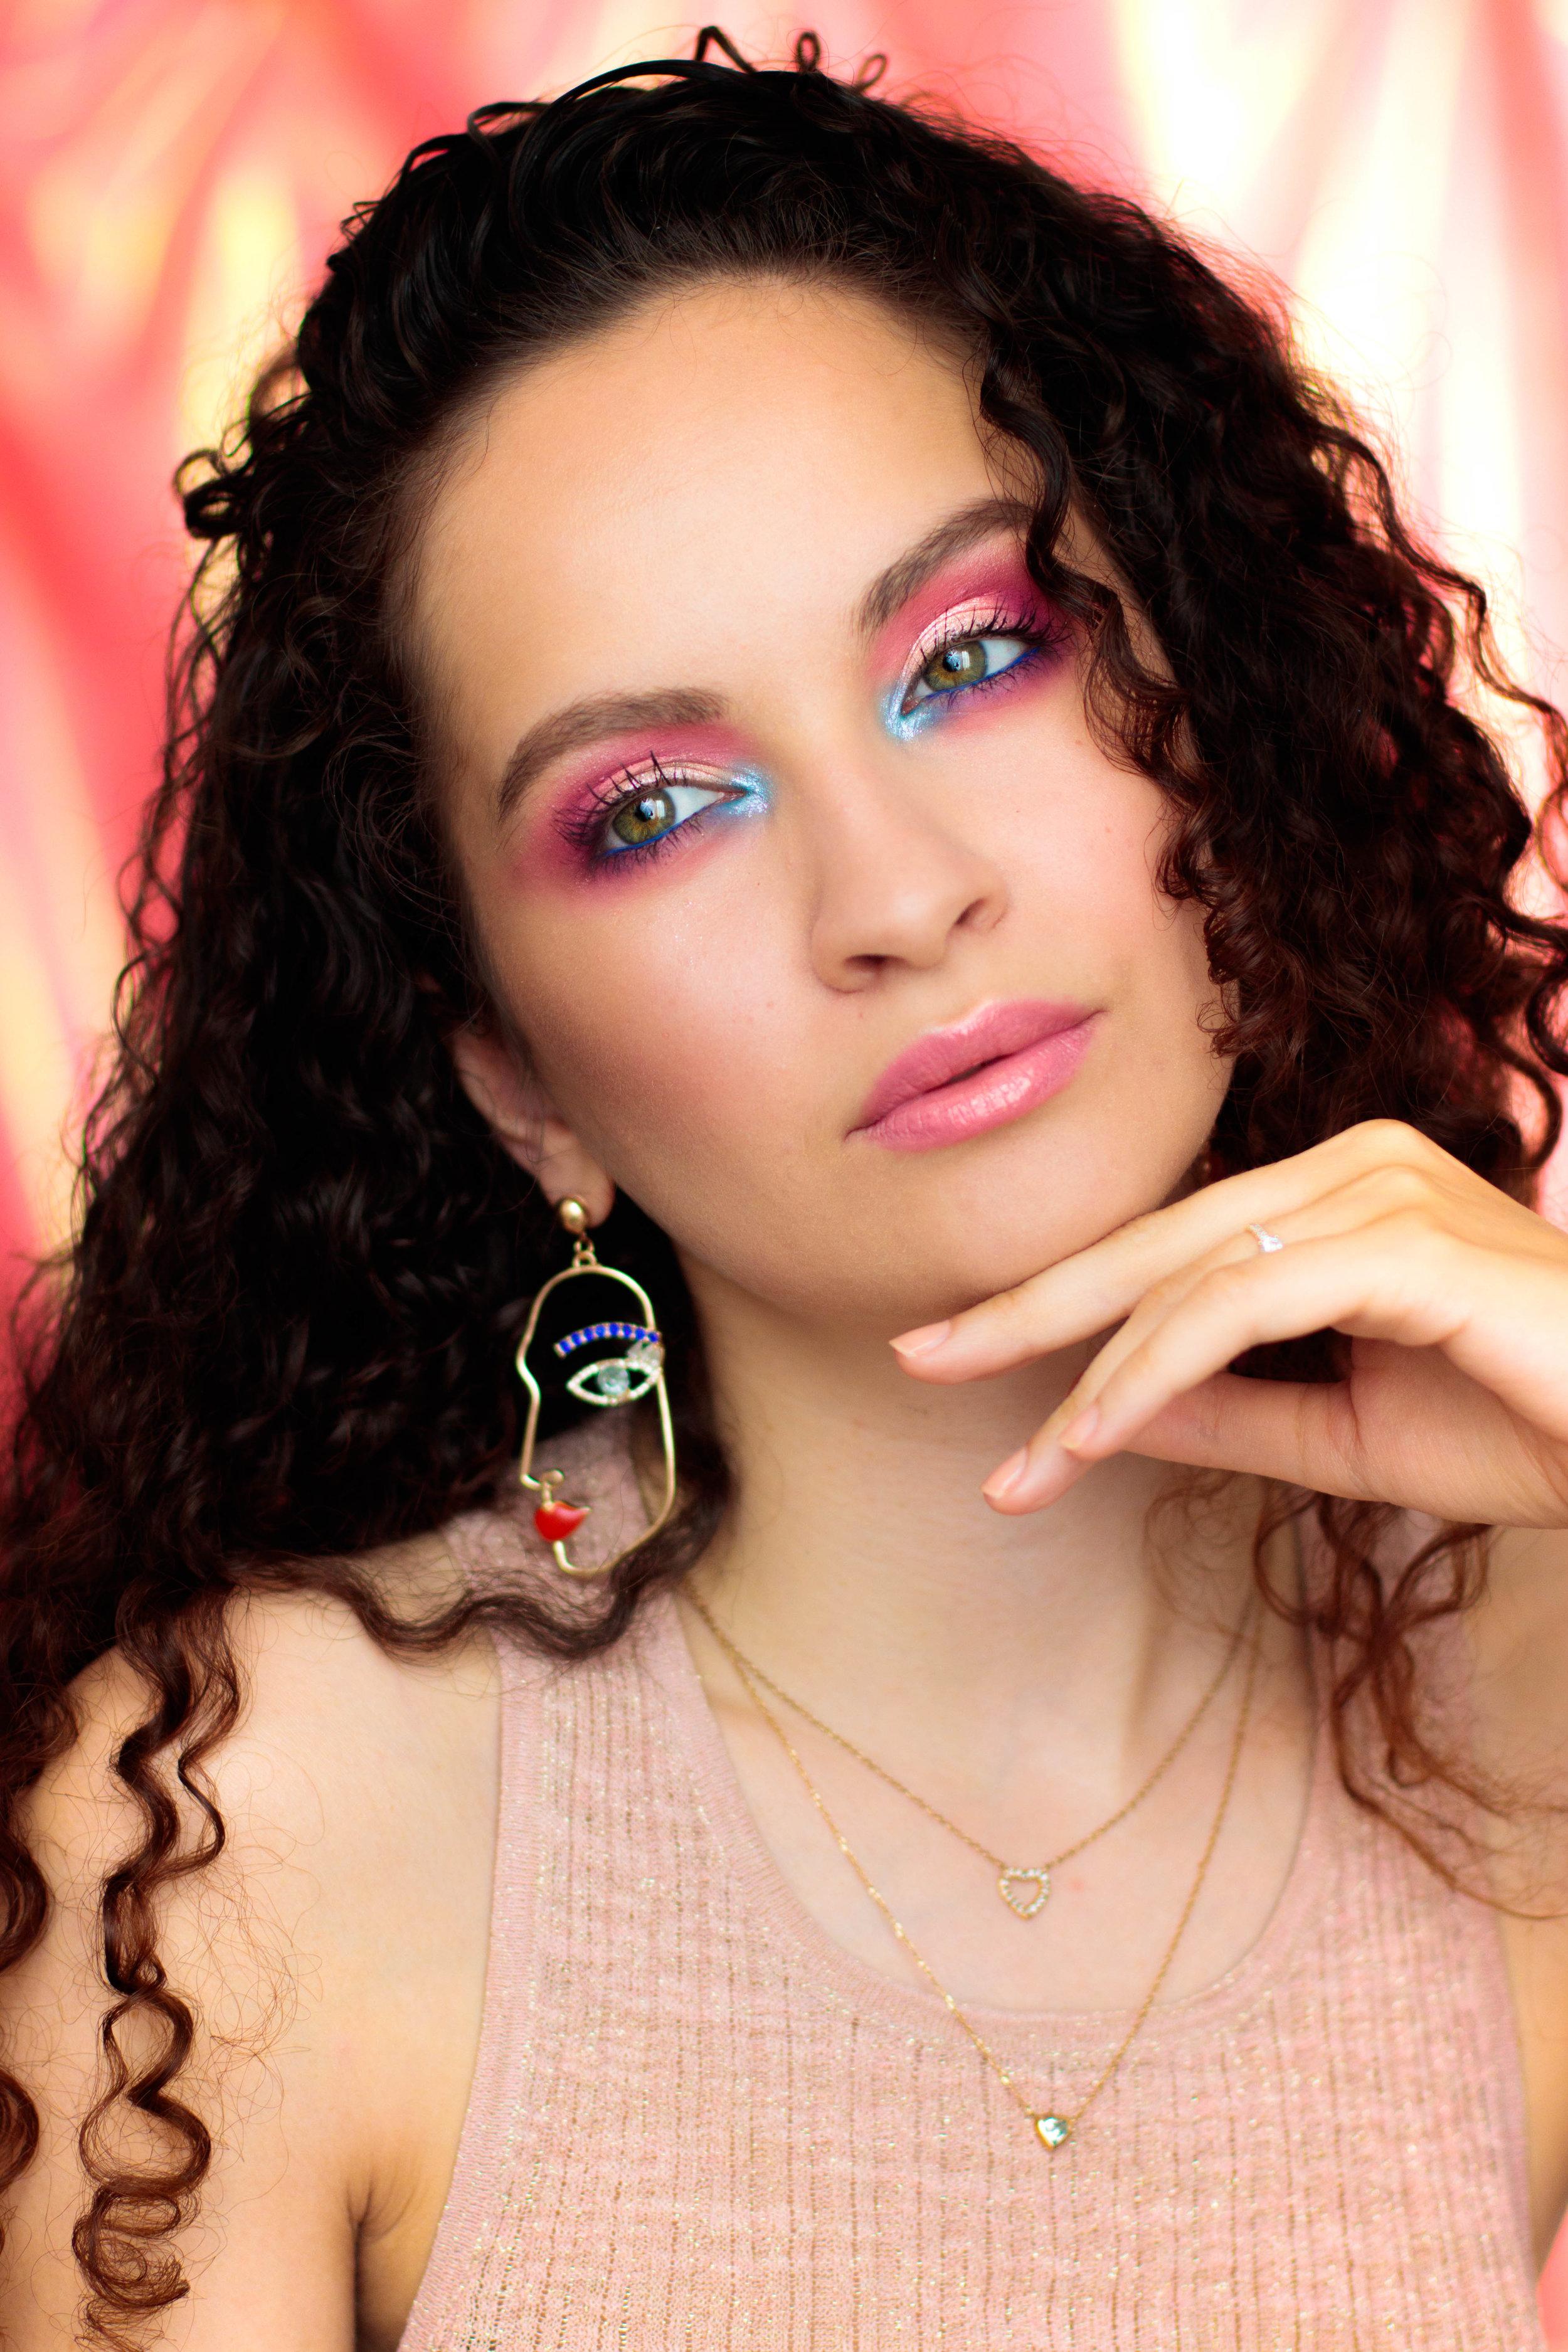 paradise-makeup-pauuulette-eyn-bright-matte-beauty-bay-1.jpg